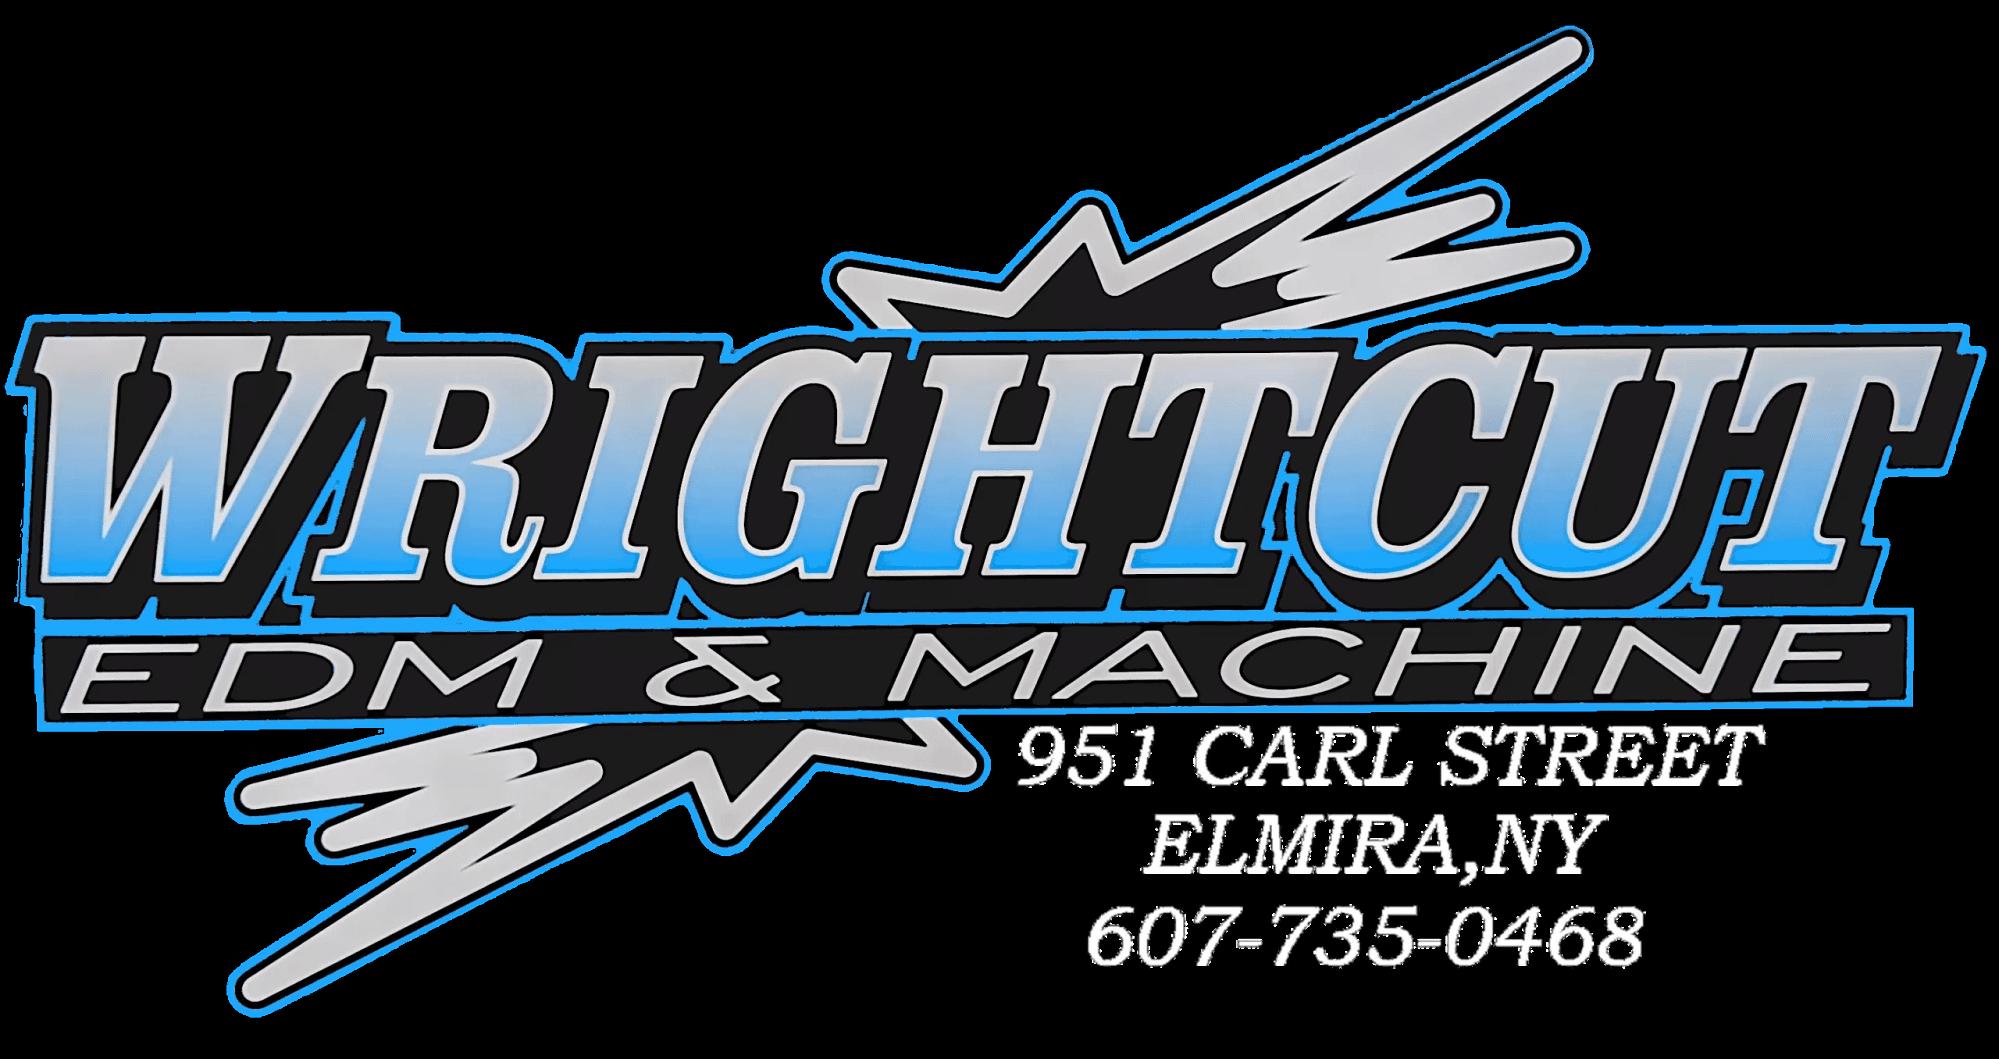 Wrightcut EDM & Machine